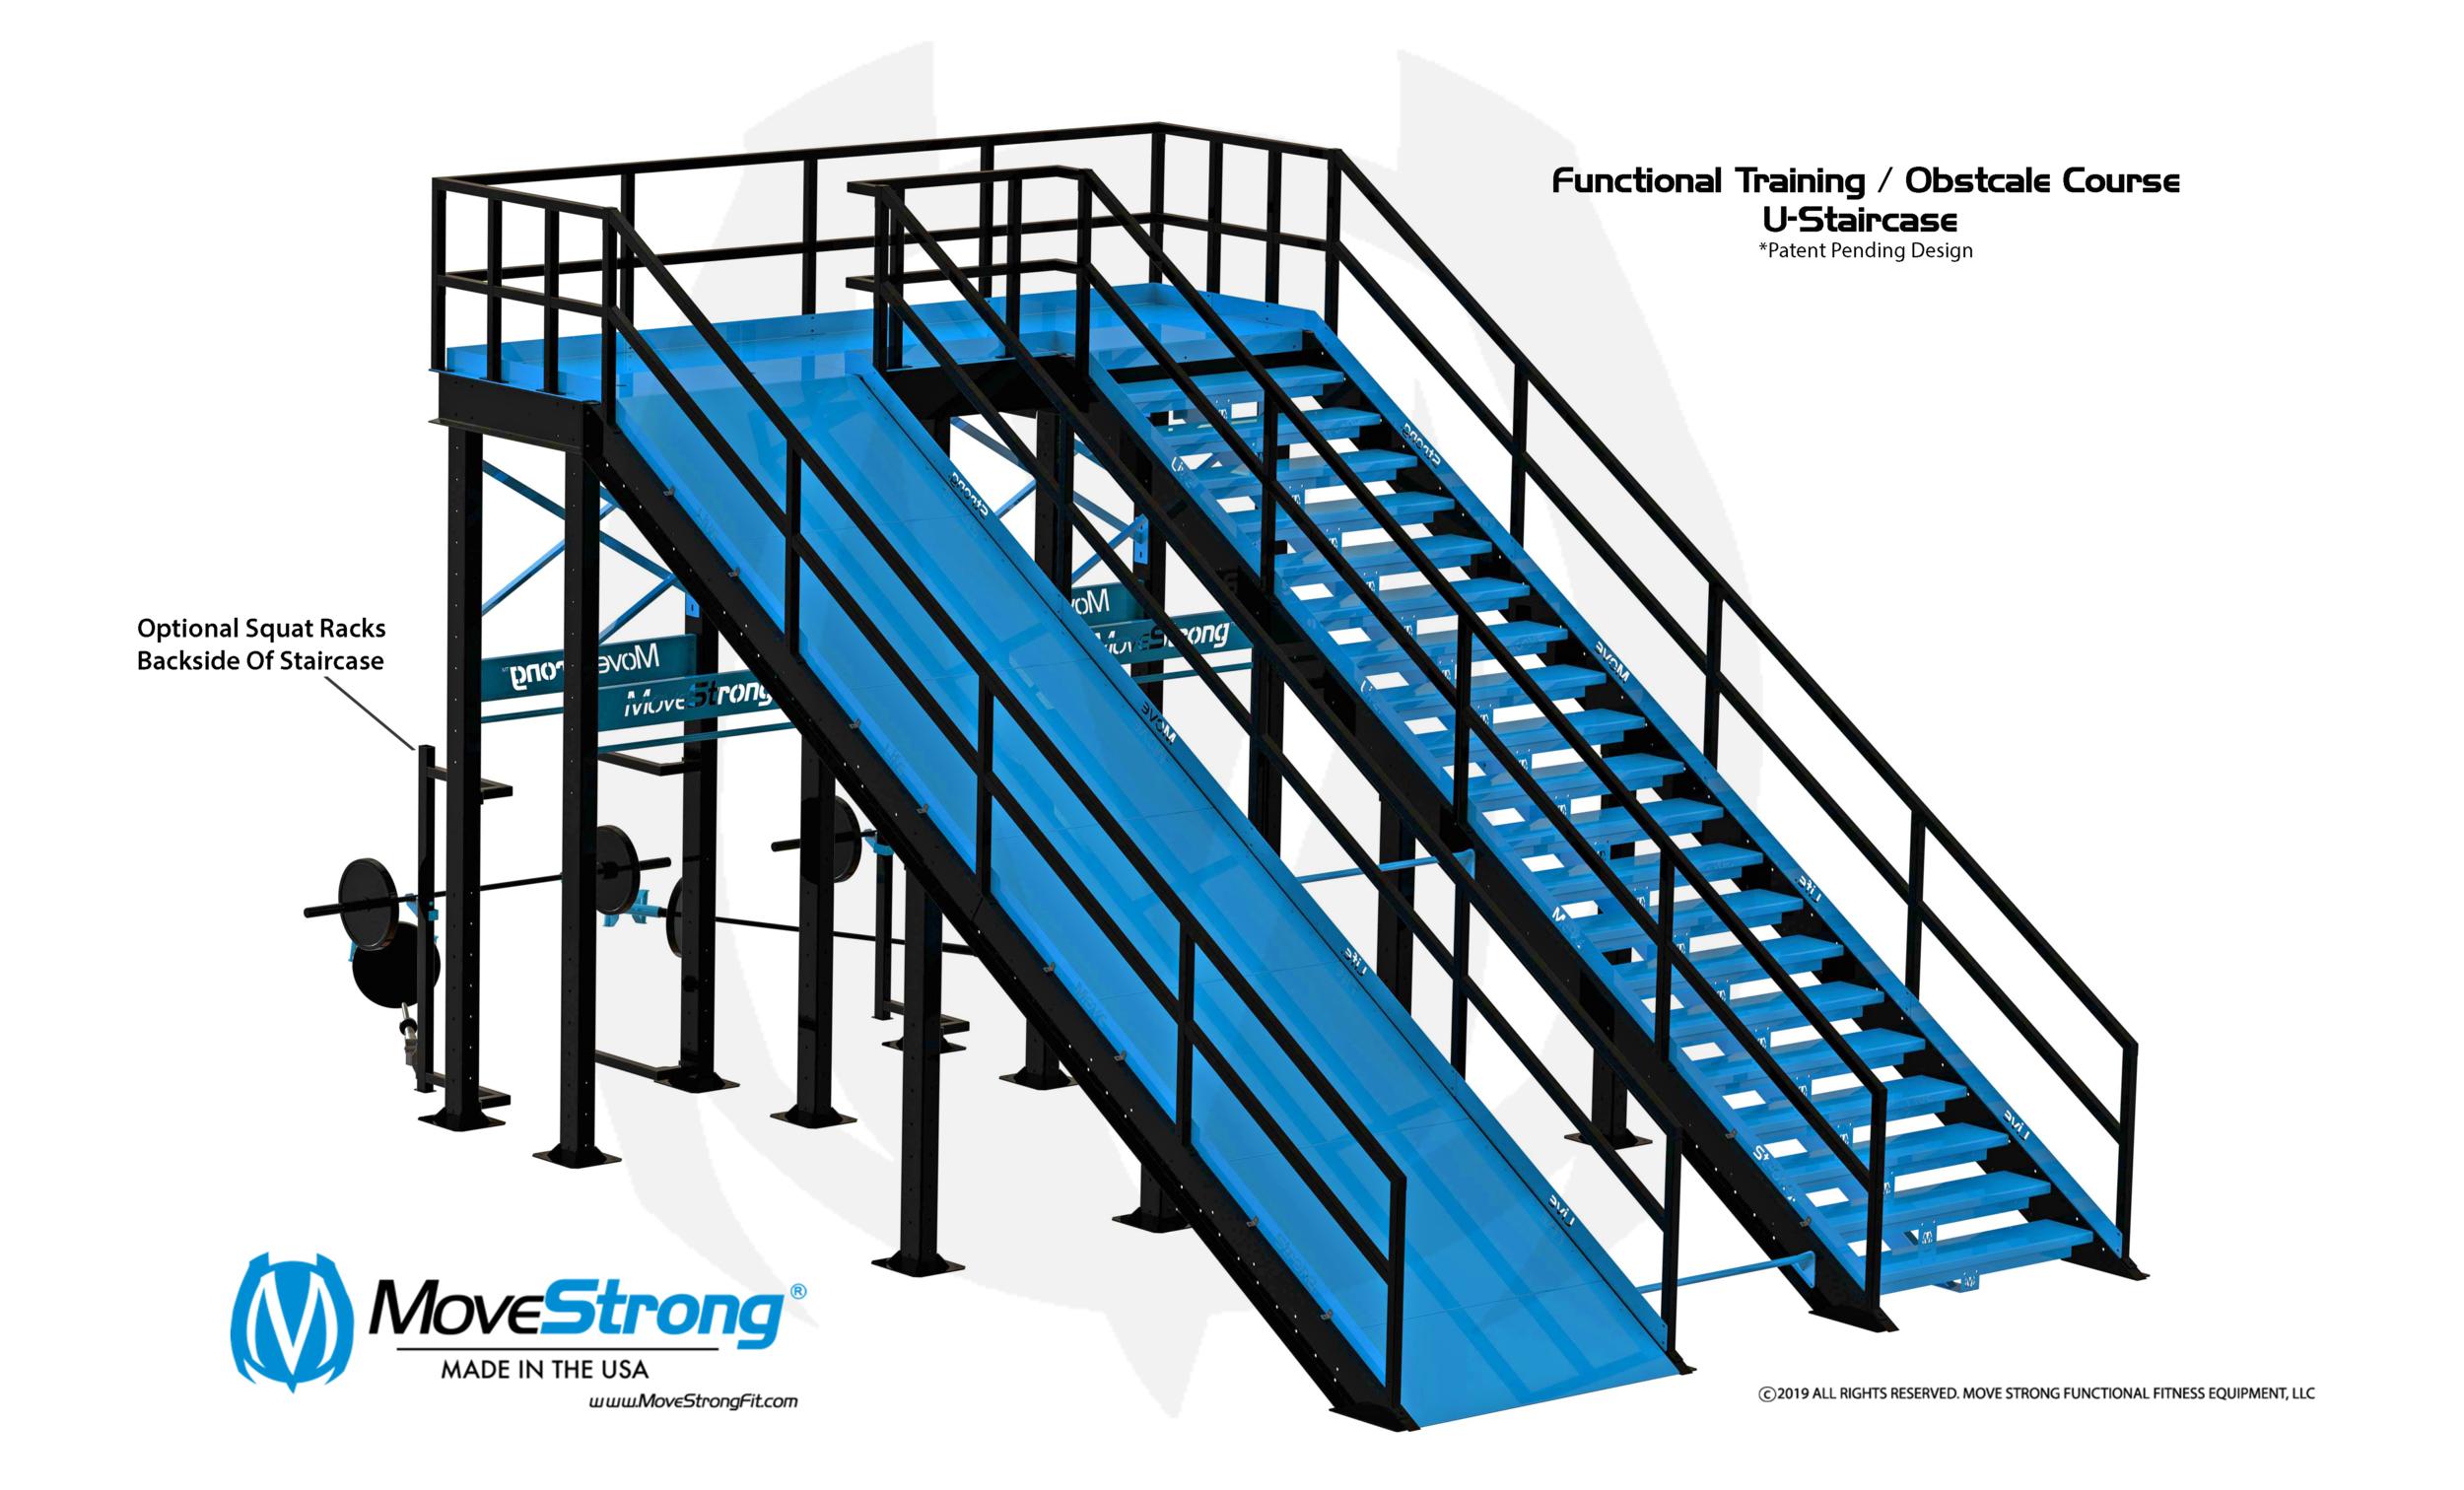 Stair Training Assy - U-Shaped - 20A_LOGO_Web image.png